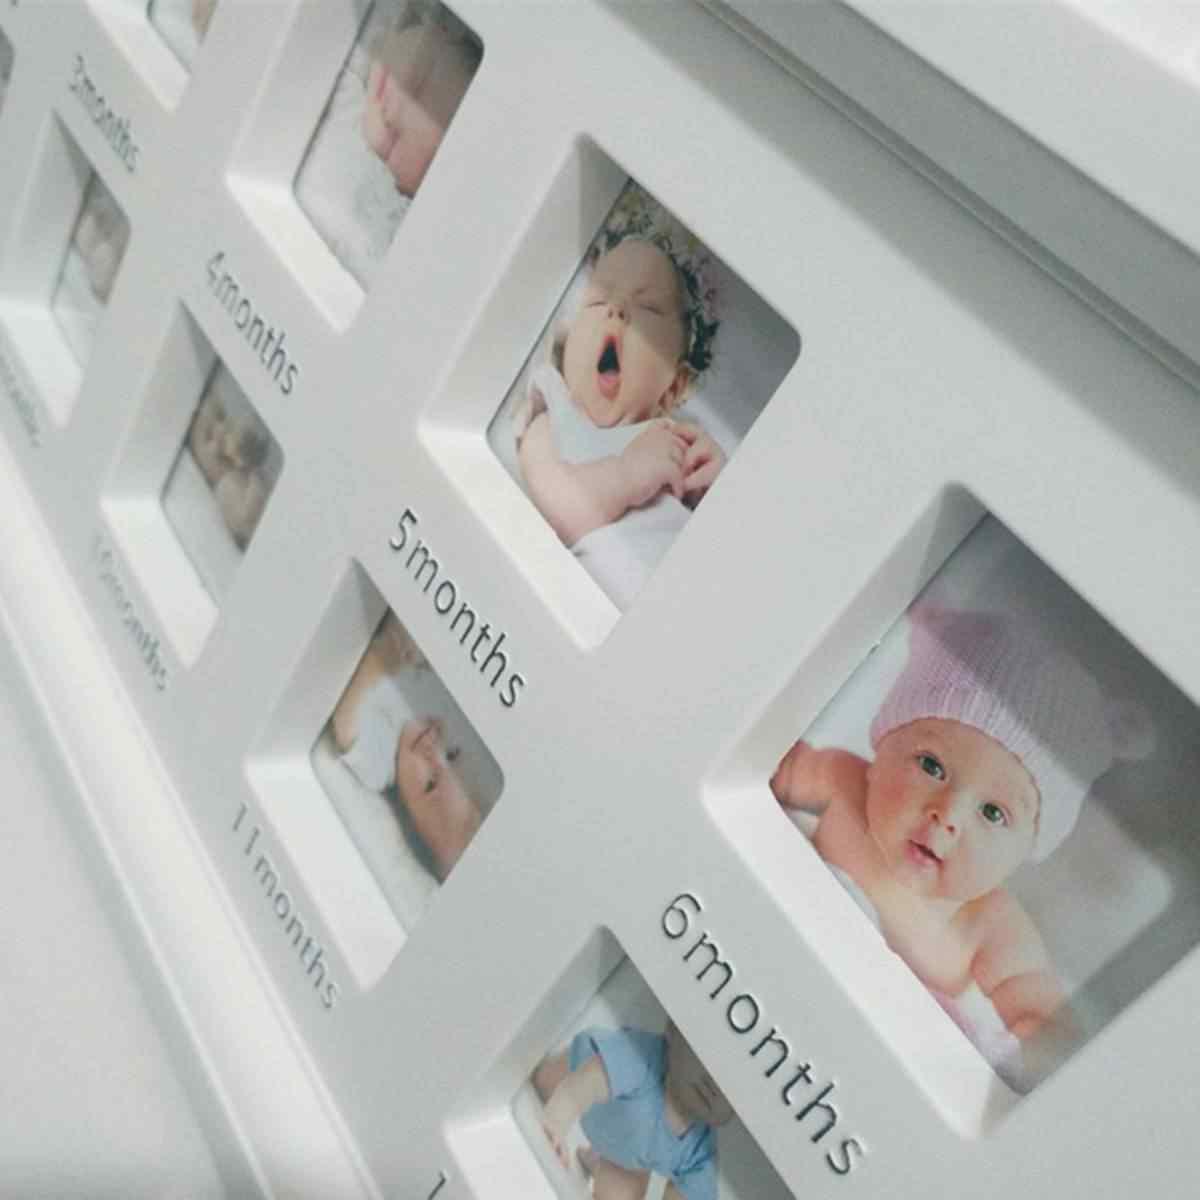 Cute Baby Photo frame DIY handprint or footprint 12 Months Photo Frame Baby Boy Girl My 1 One Year White Blue Pink Home Decor